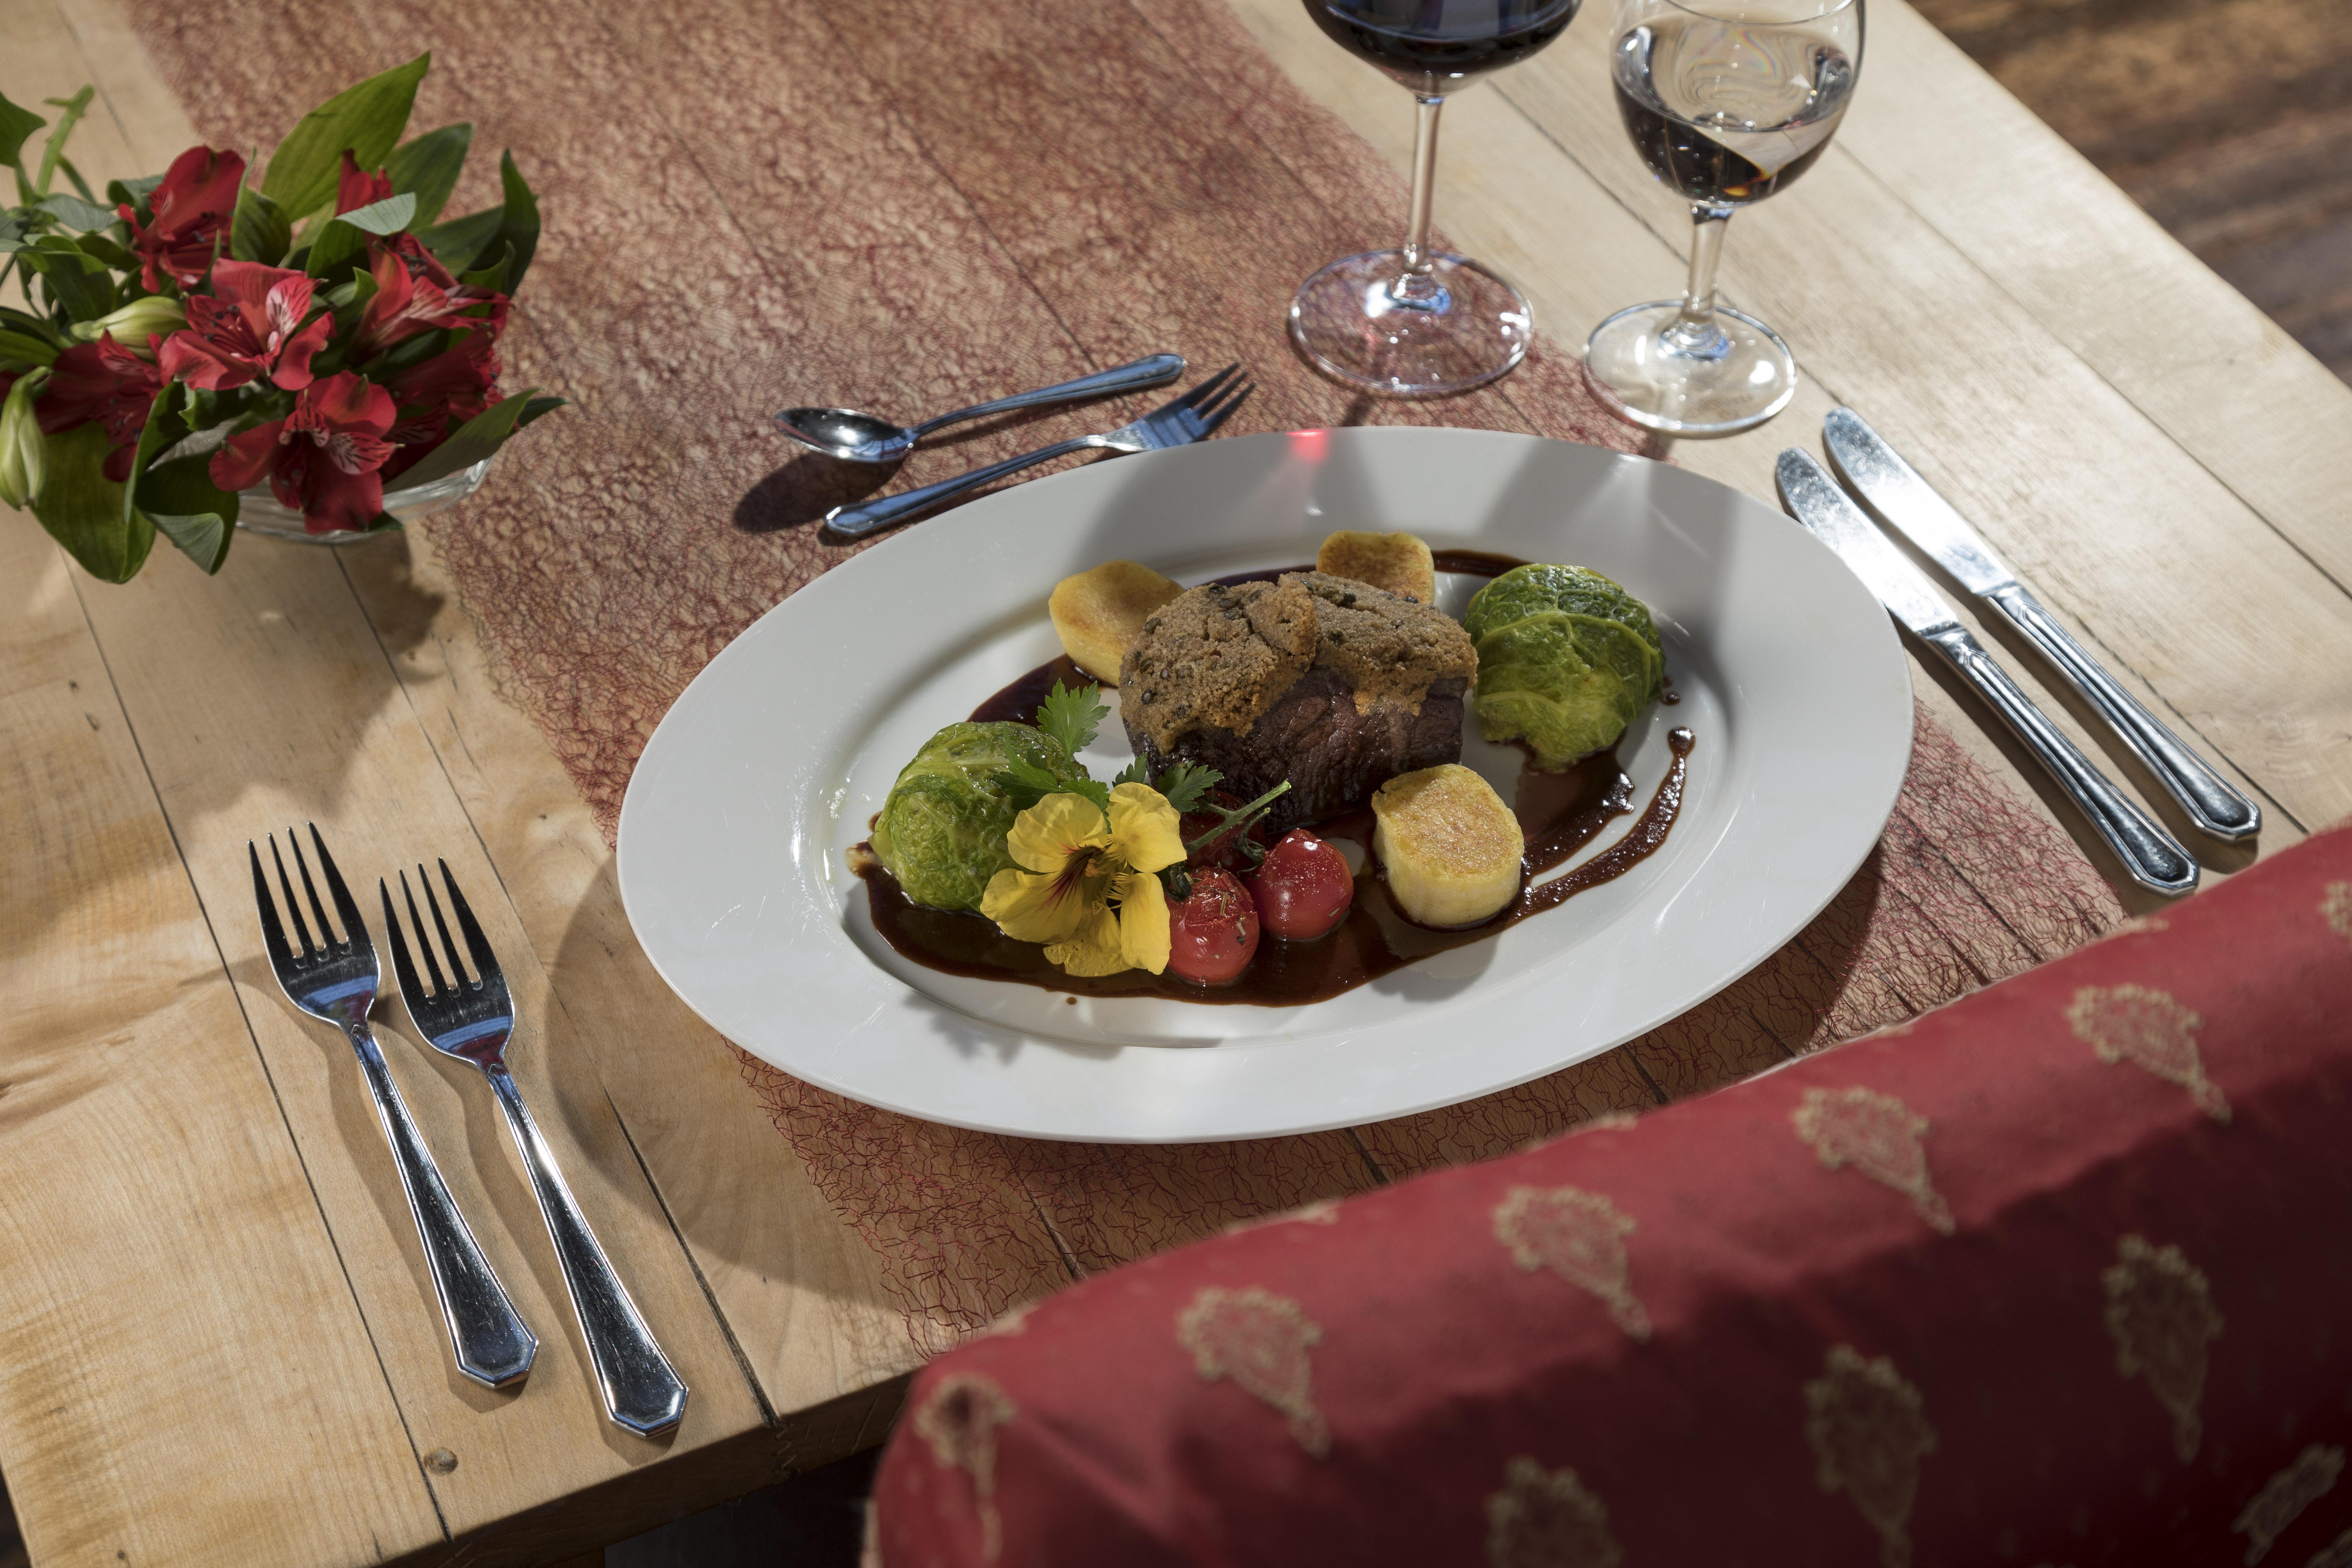 gastronomie burghaus villa kronenburg. Black Bedroom Furniture Sets. Home Design Ideas